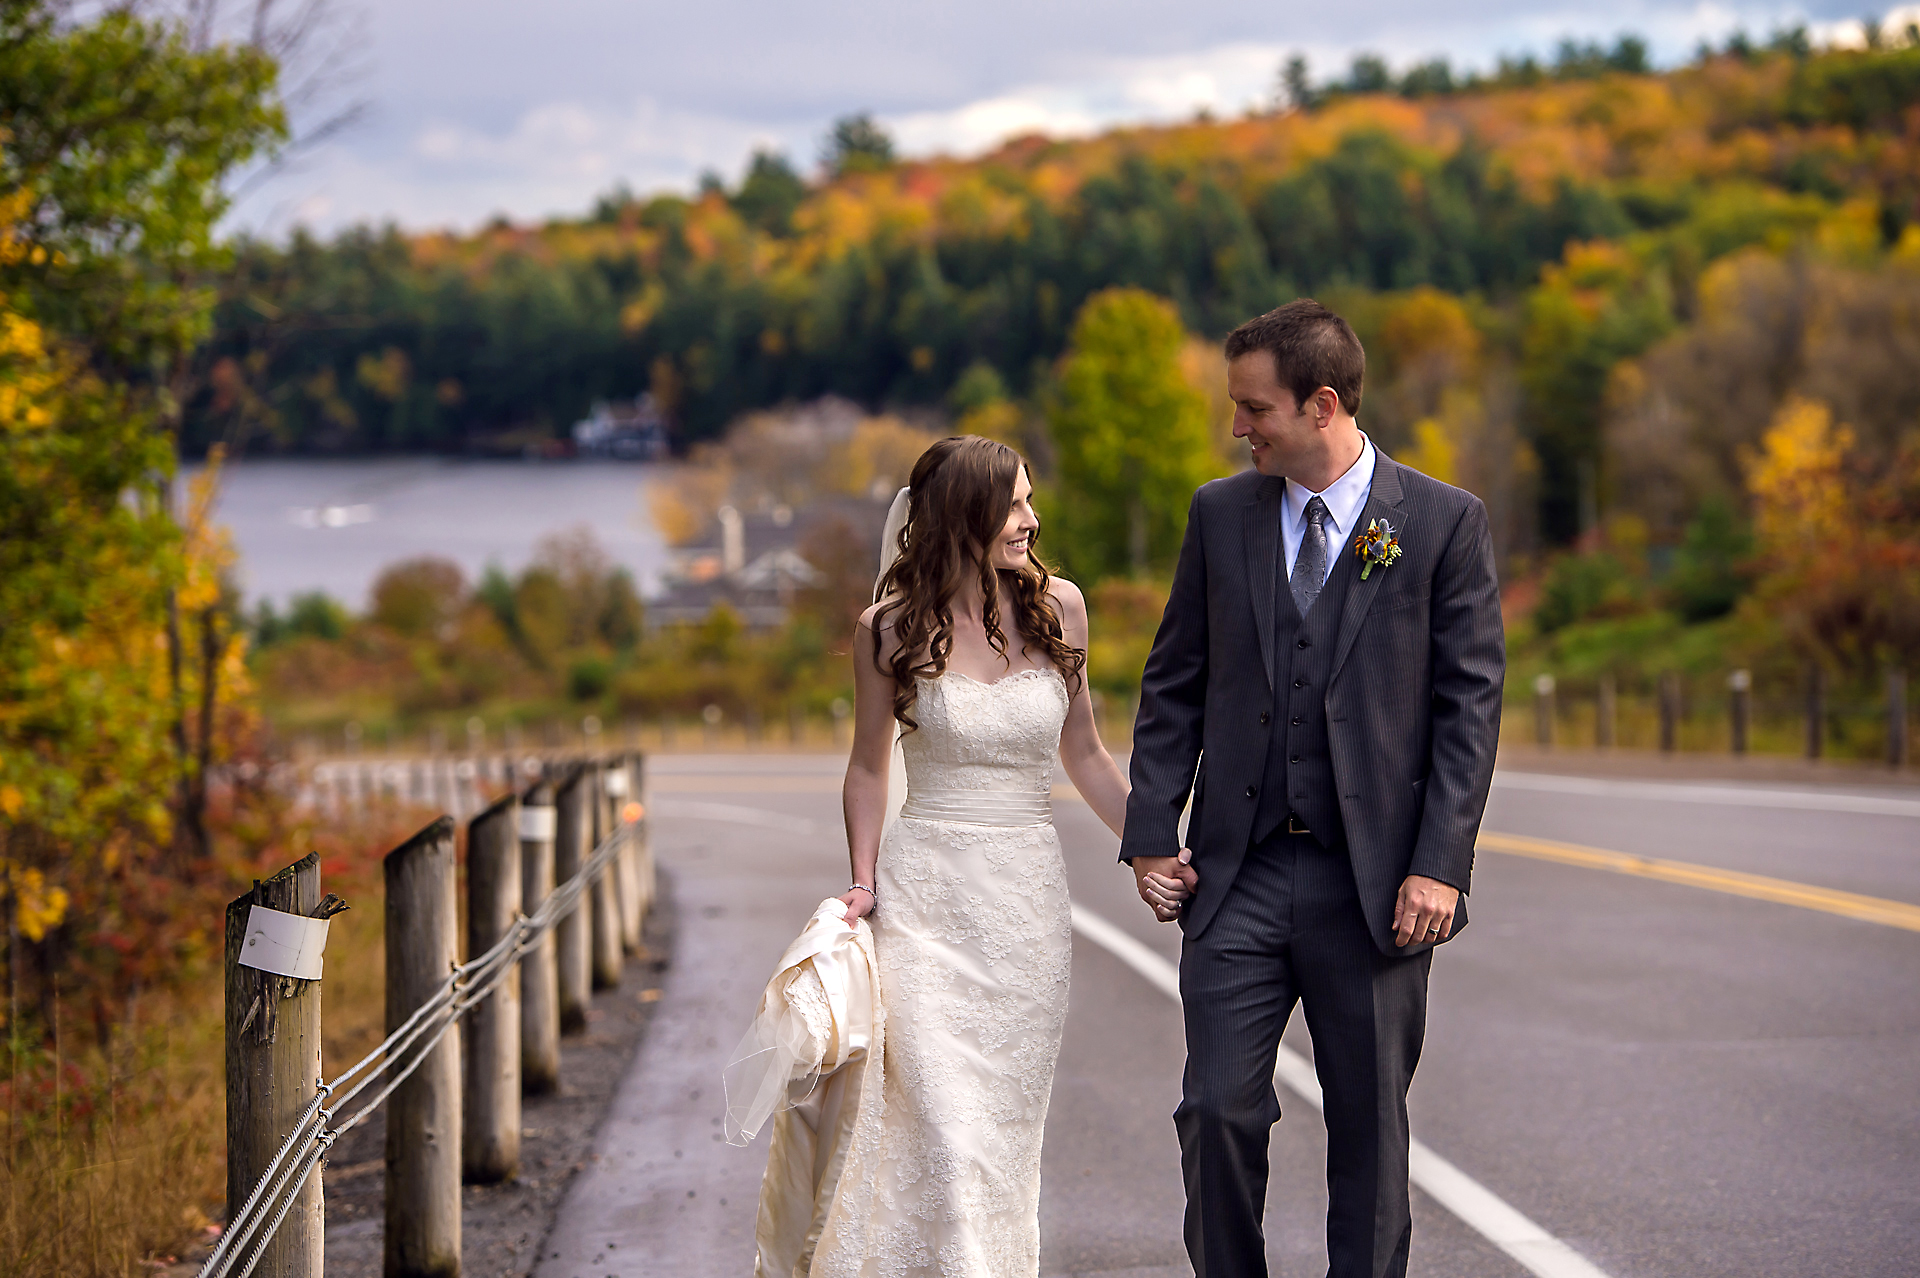 Nathan & Linda | Brooksfield Farms Wedding | Muskoka Wedding Photography20